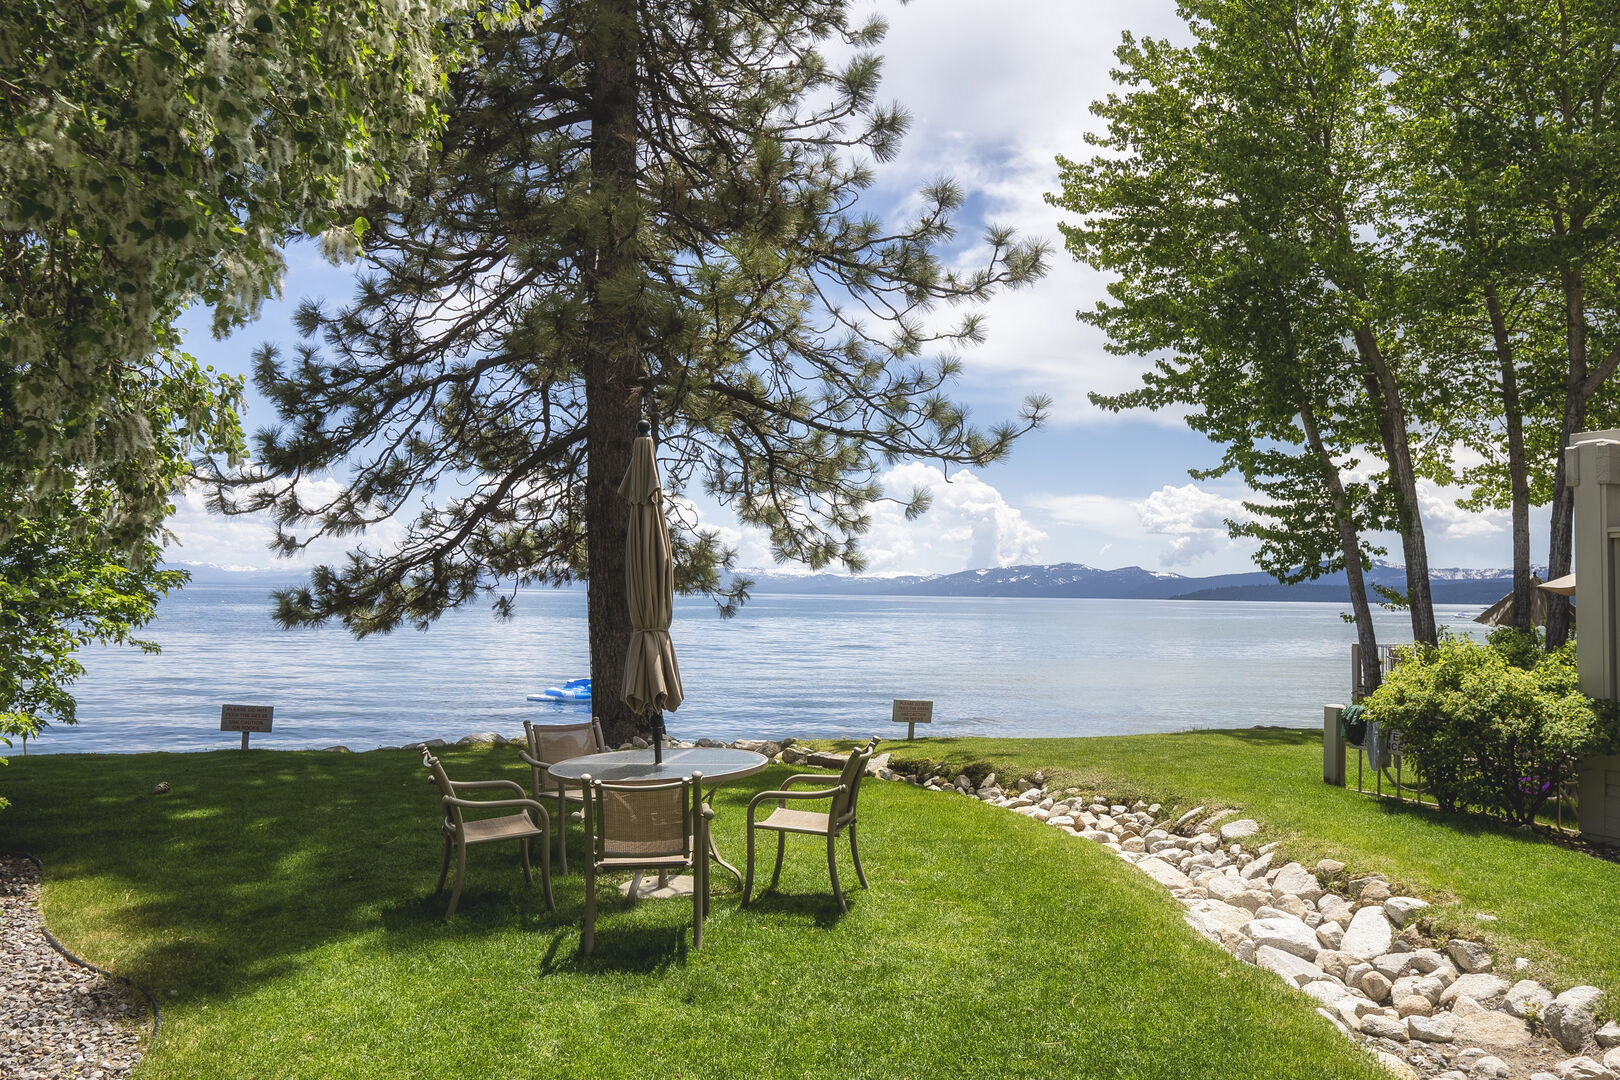 Lake Tahoe Outdoor Seating Area